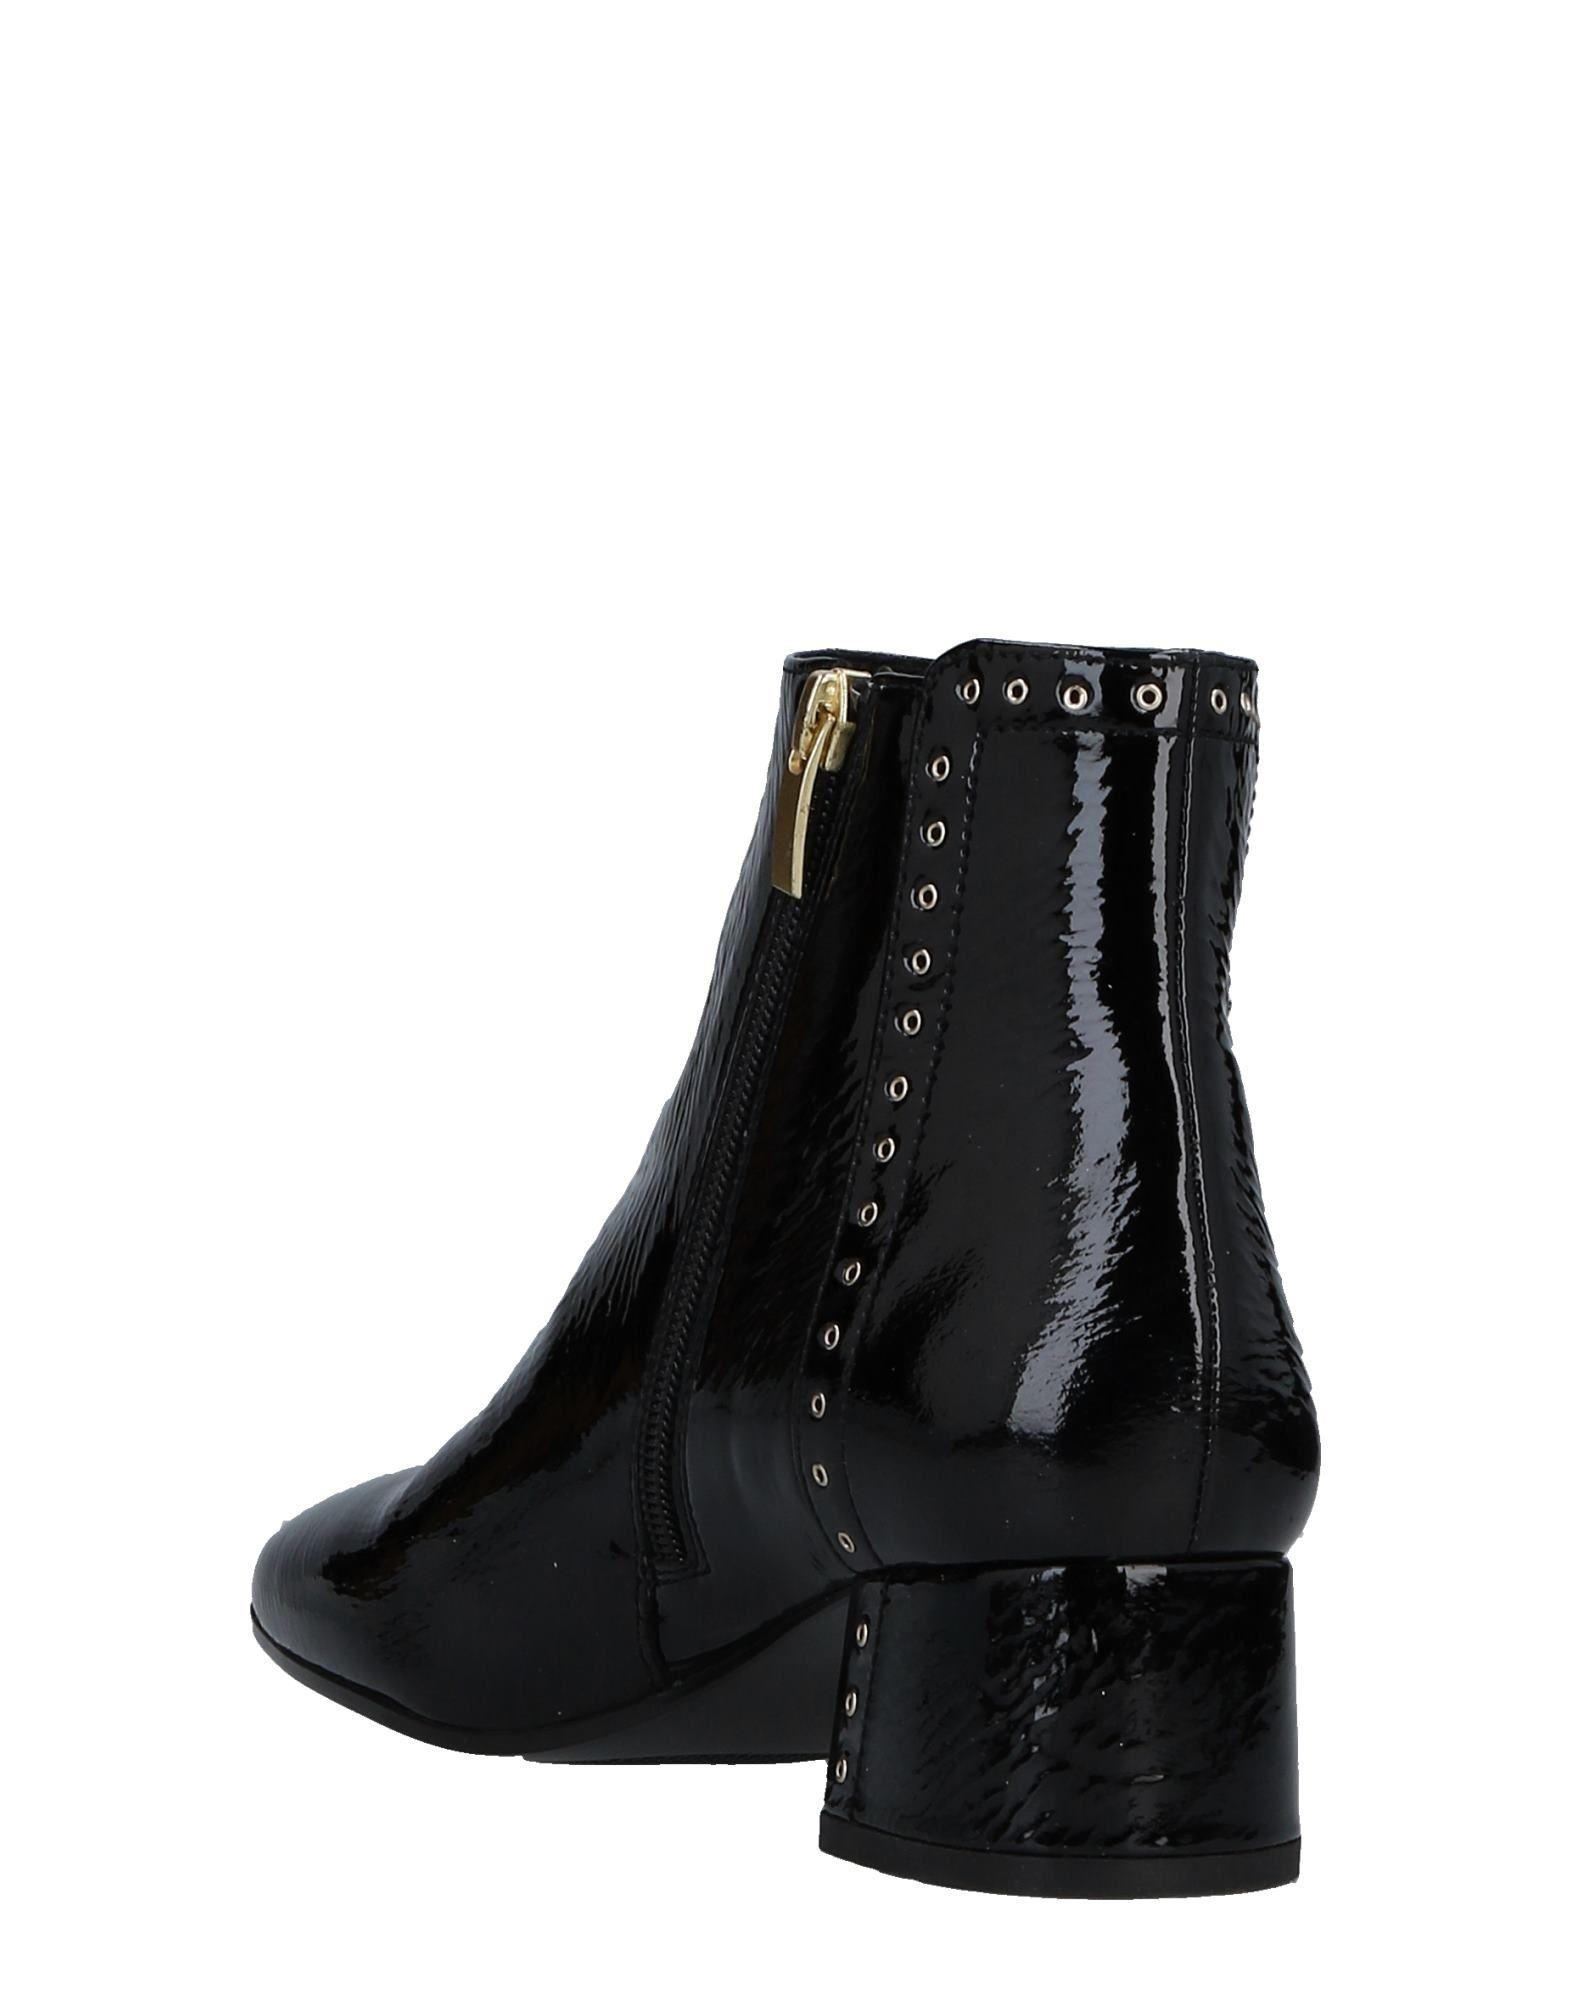 Etwob Stiefelette Damen  11512249MQ Gute Schuhe Qualität beliebte Schuhe Gute 2044a9